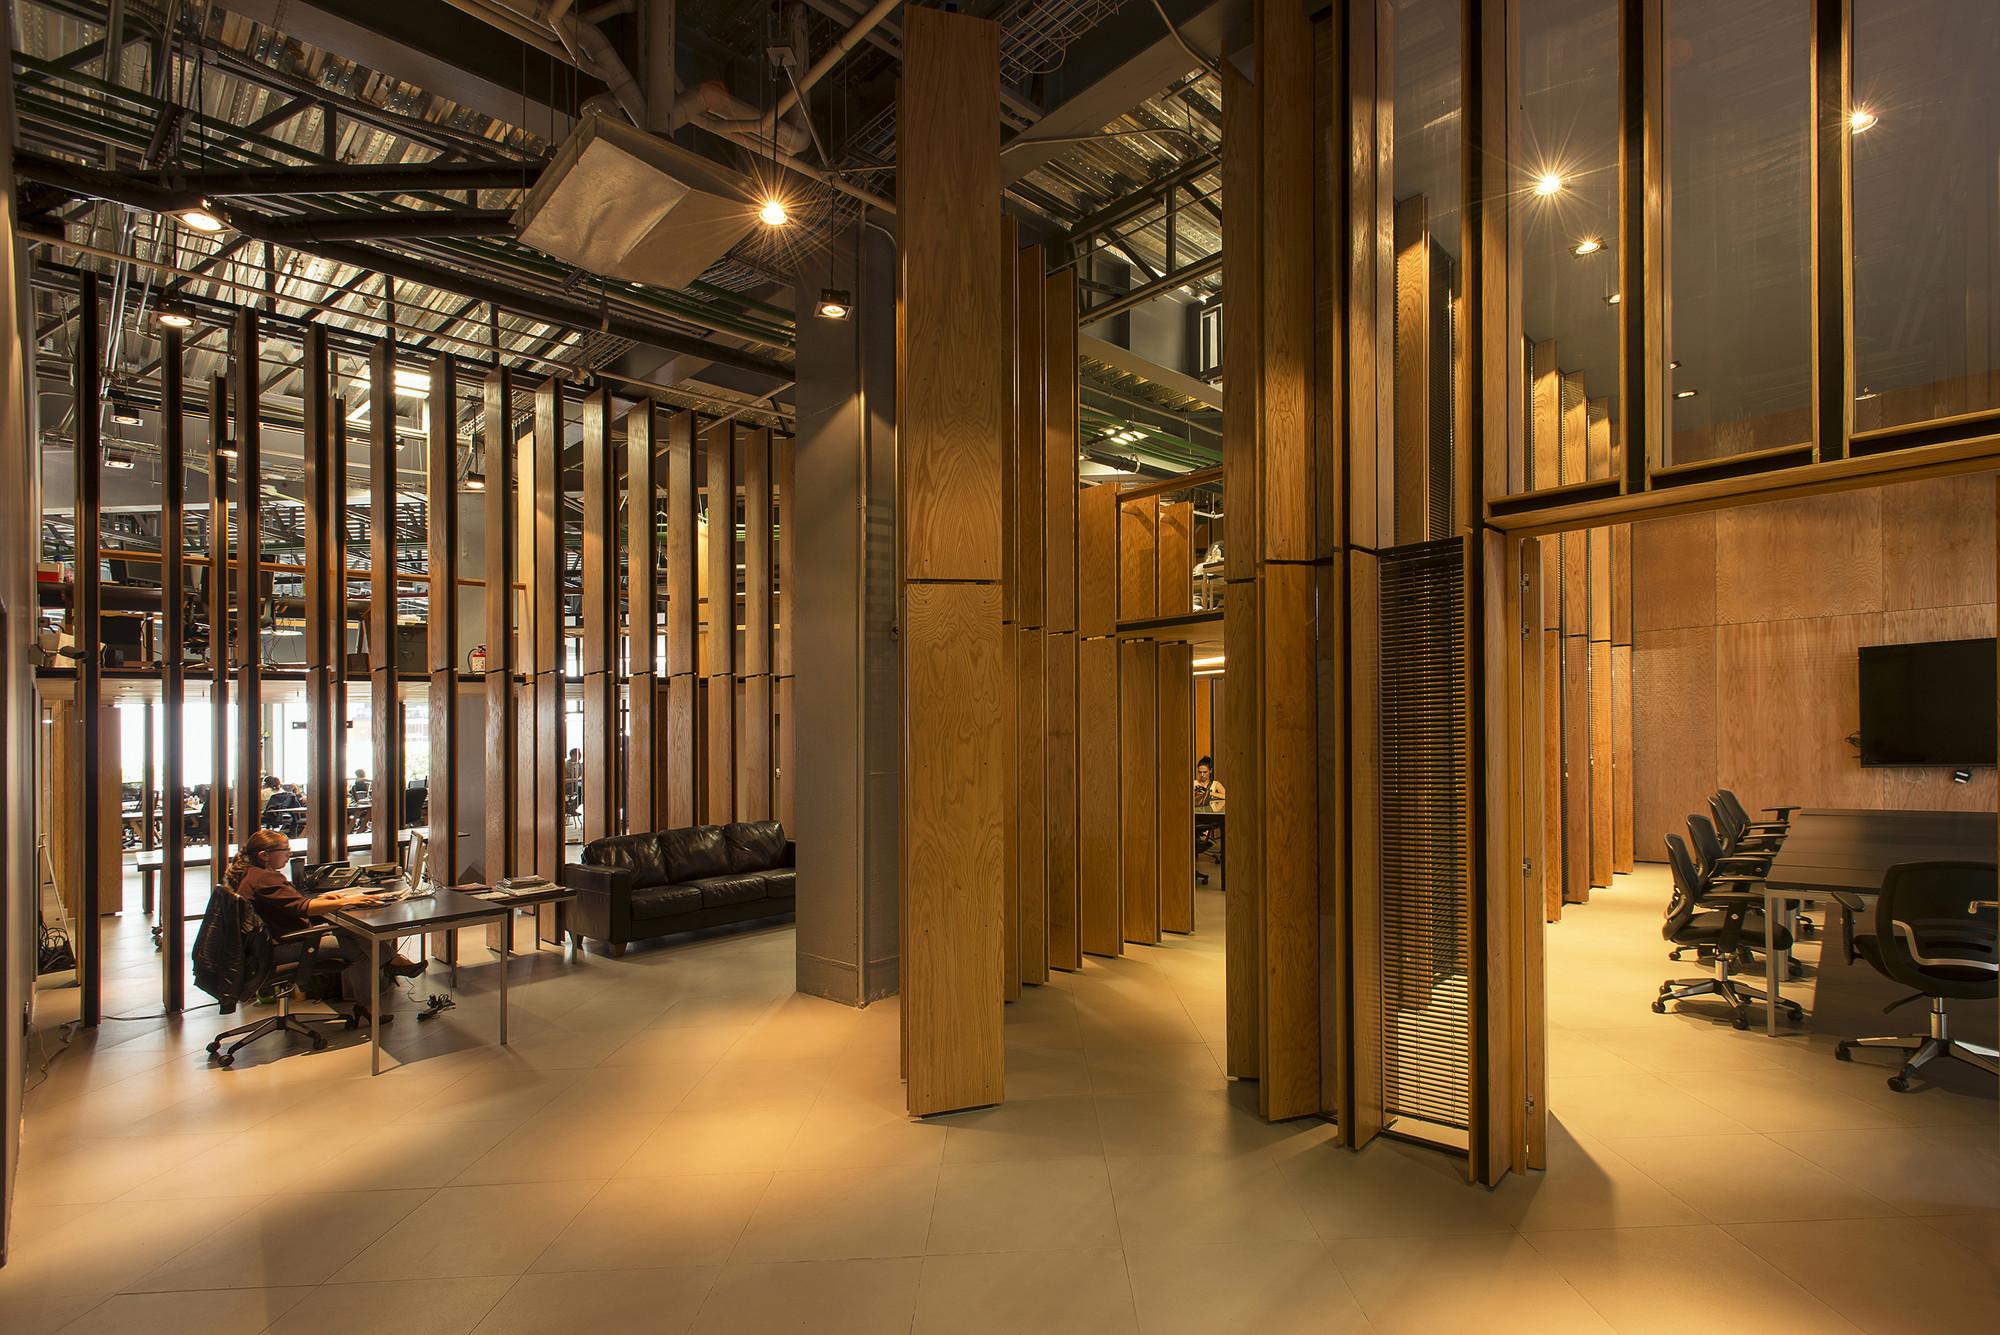 Element Studios / Manada Architectural Boundaries, © Jaime Navarro